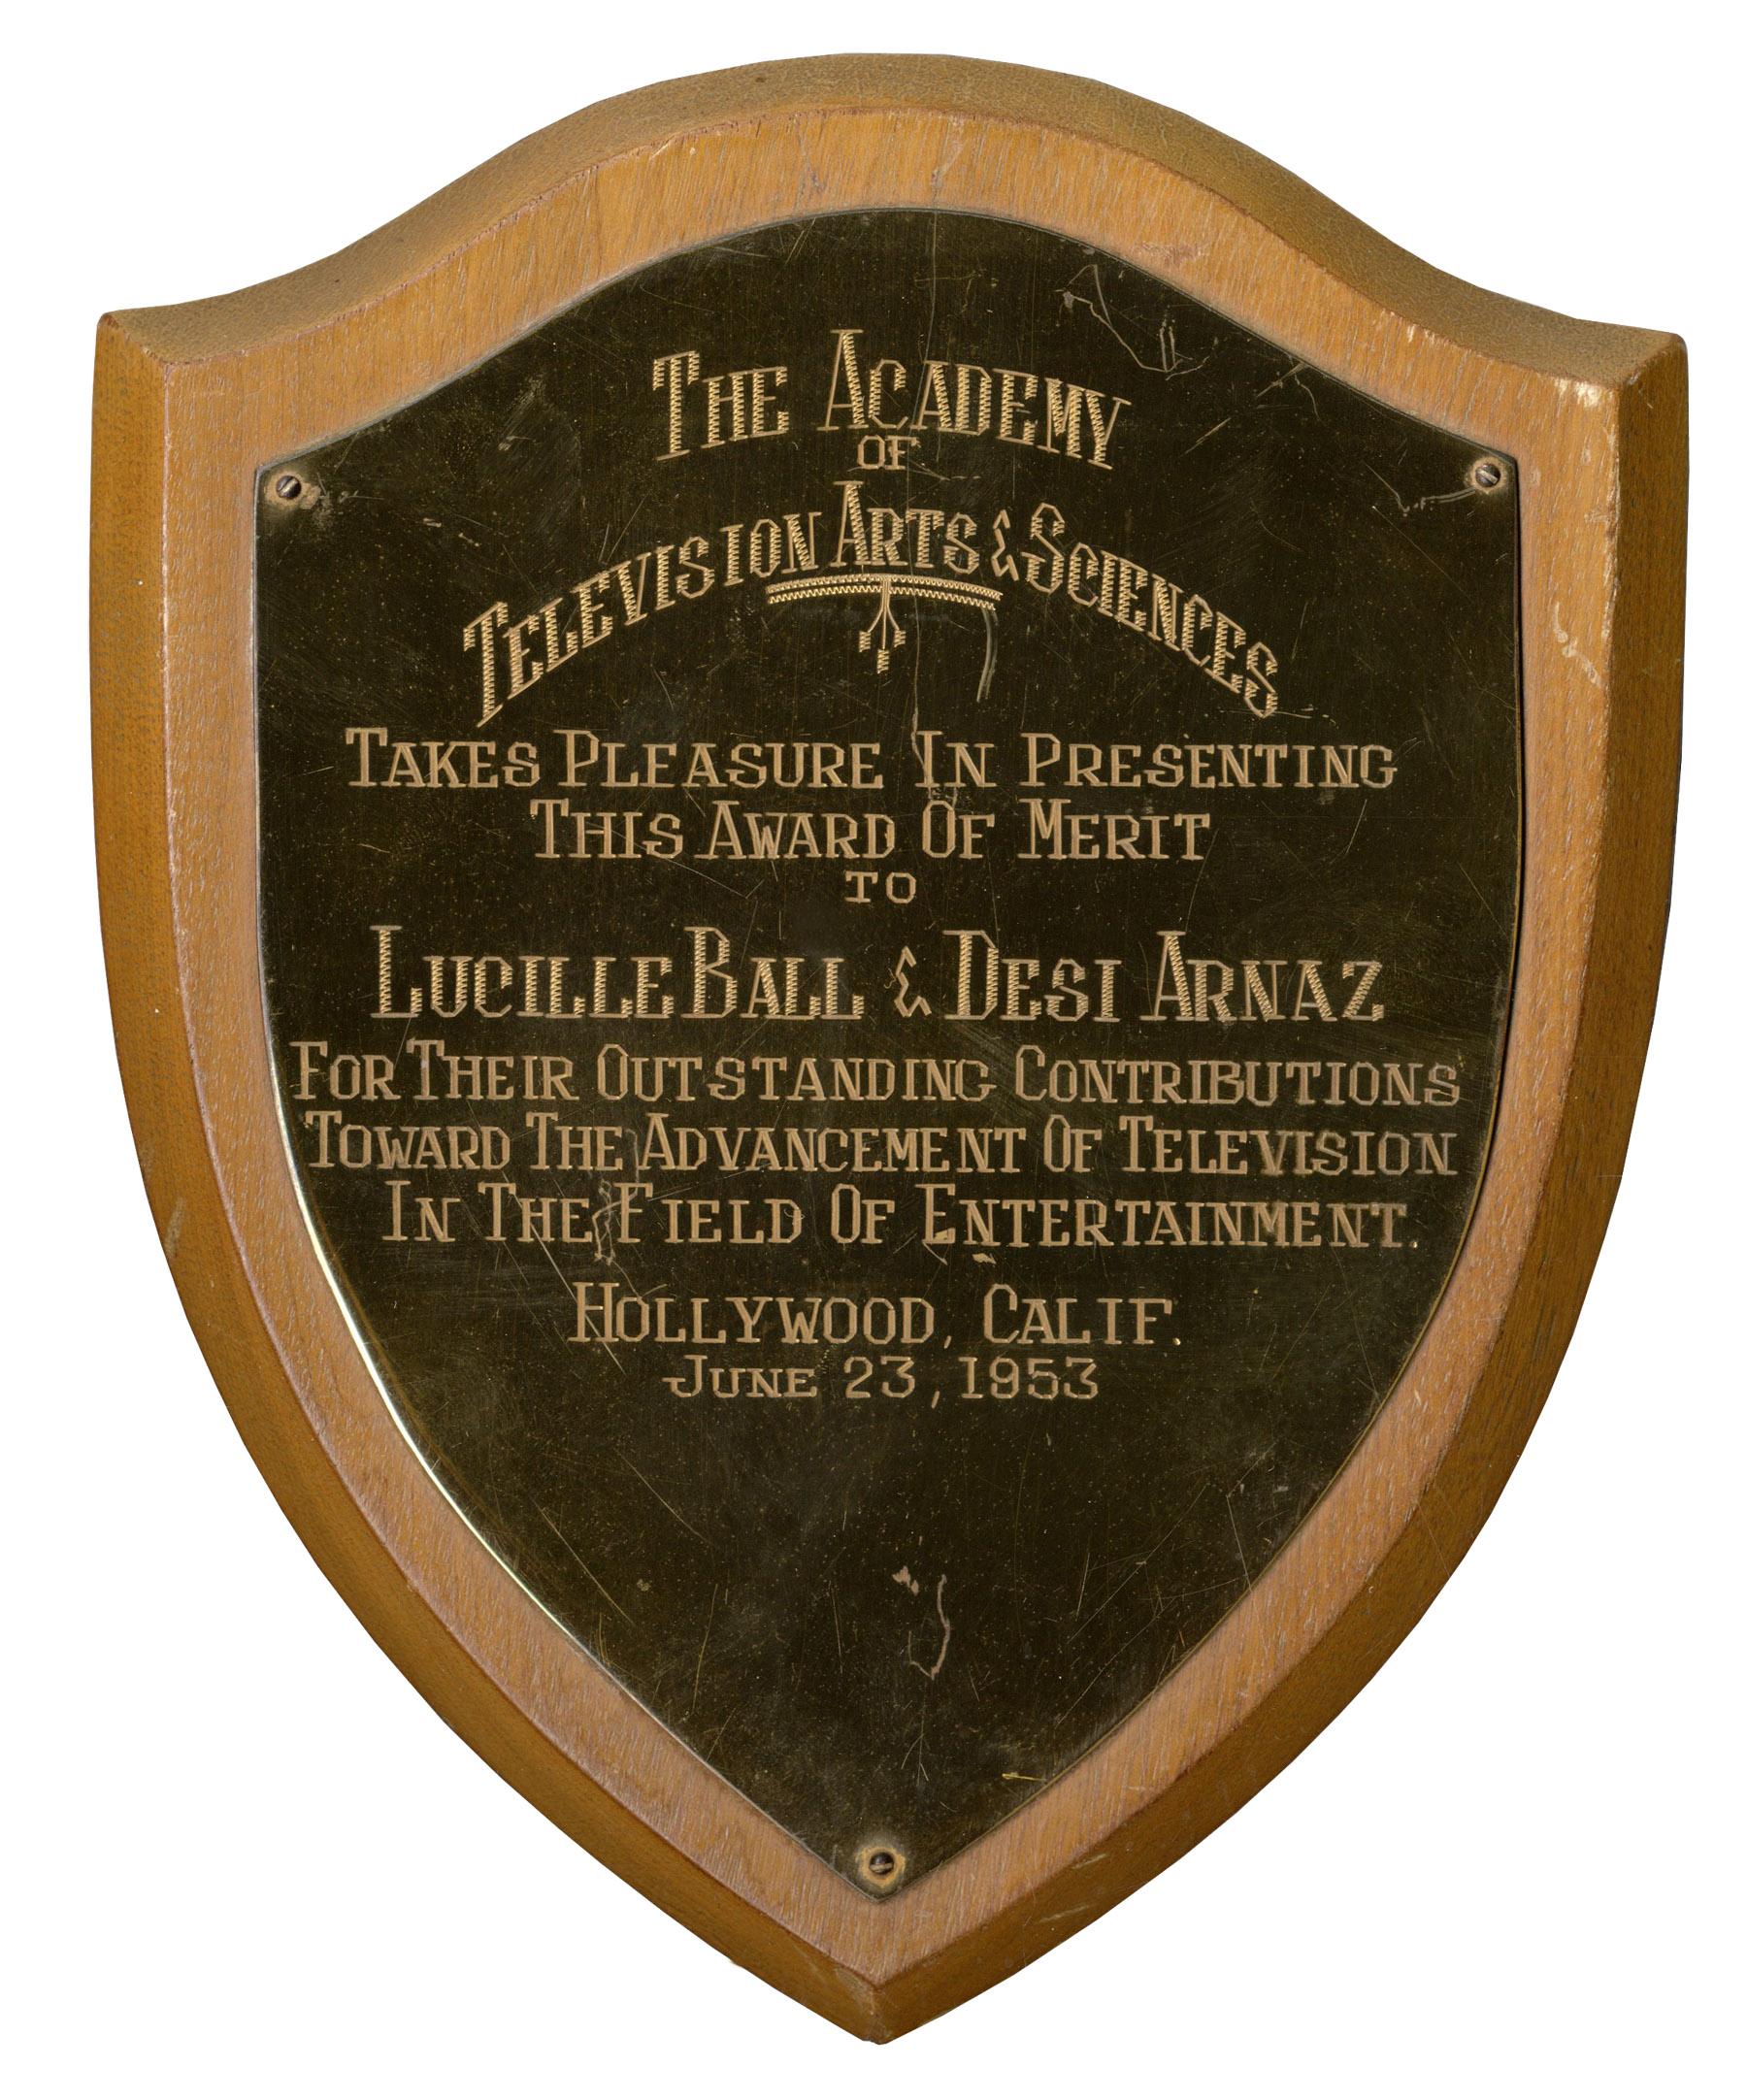 Lucille Ball Memorabilia